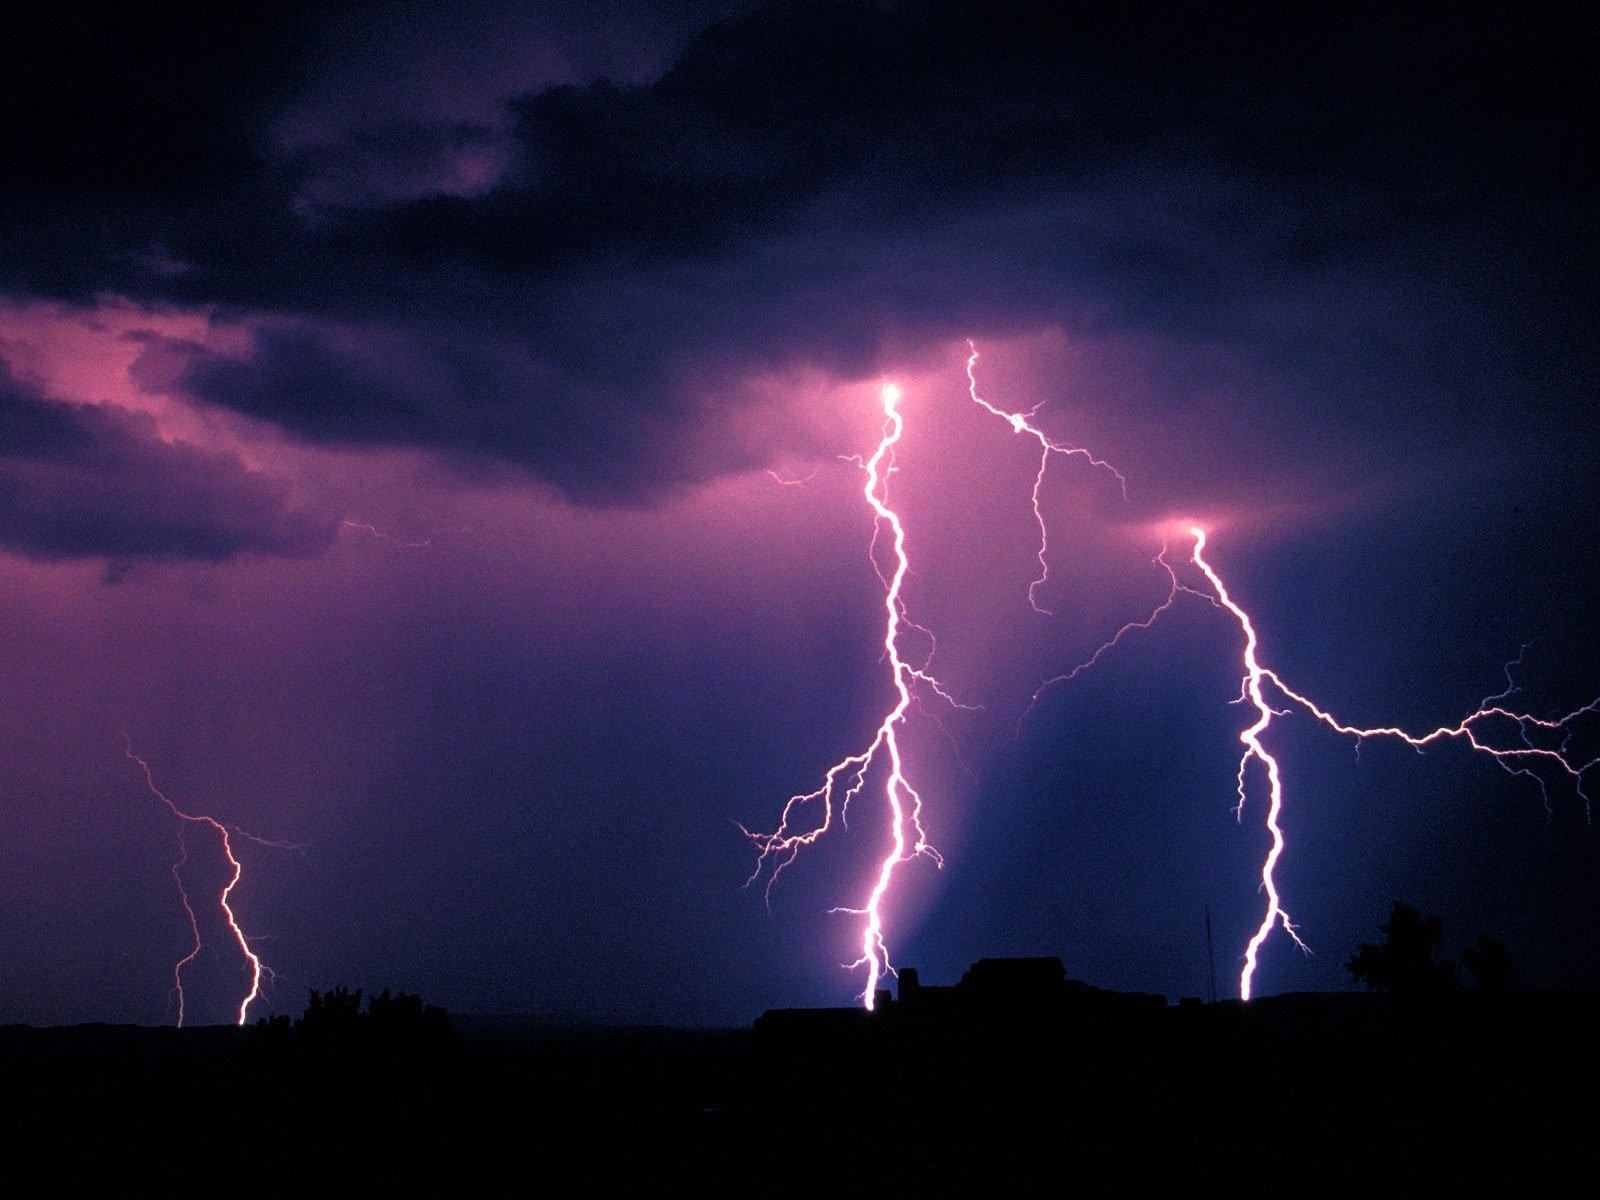 http://4.bp.blogspot.com/-mkOqL_klyb0/TZkETGlgSvI/AAAAAAAAAVY/qaNskFROCrY/s1600/Lightning_Storm_Arizona_8102_1600_1200.jpg